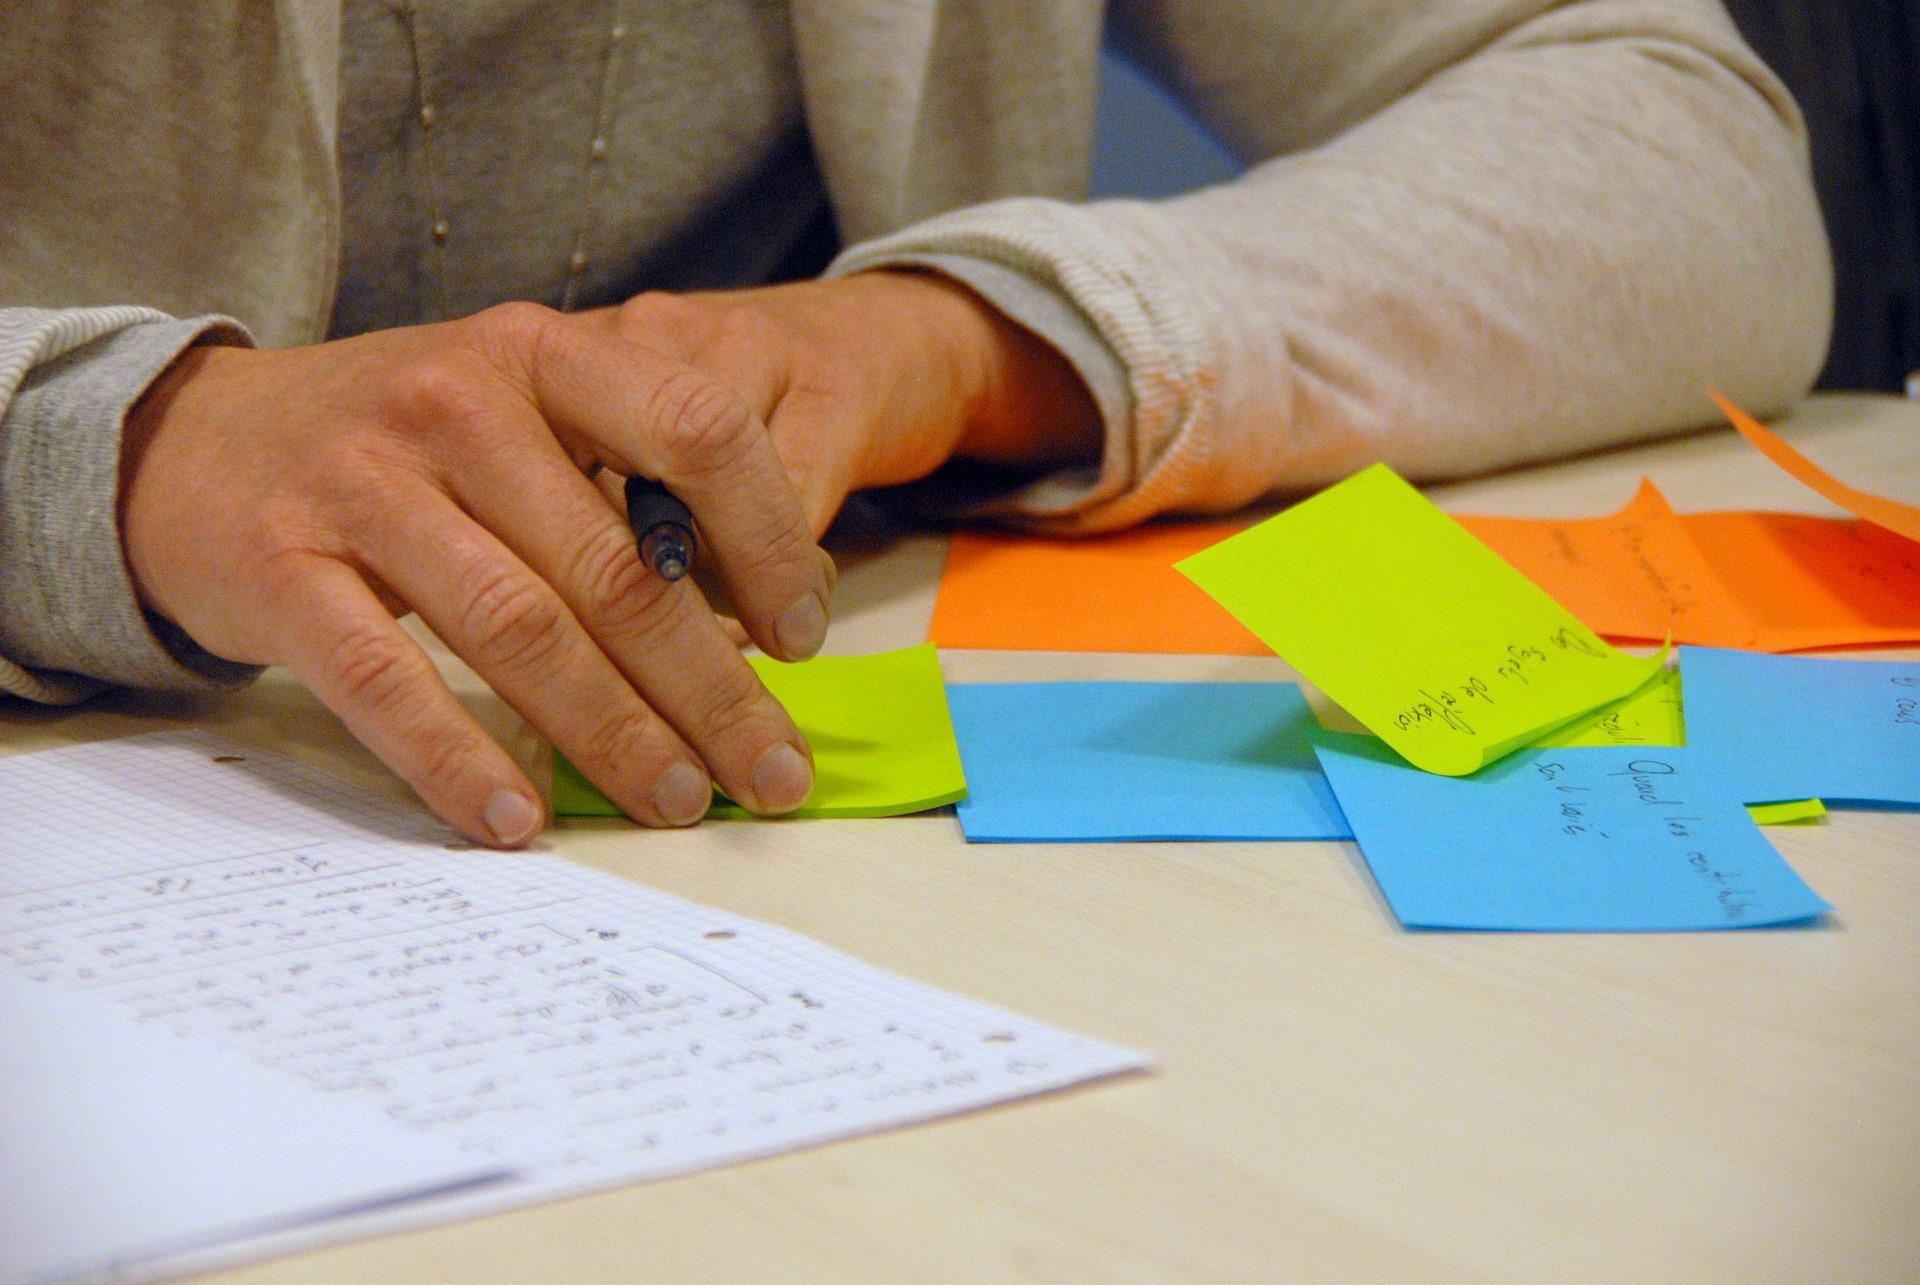 Digital marketing SWOT analysis planning